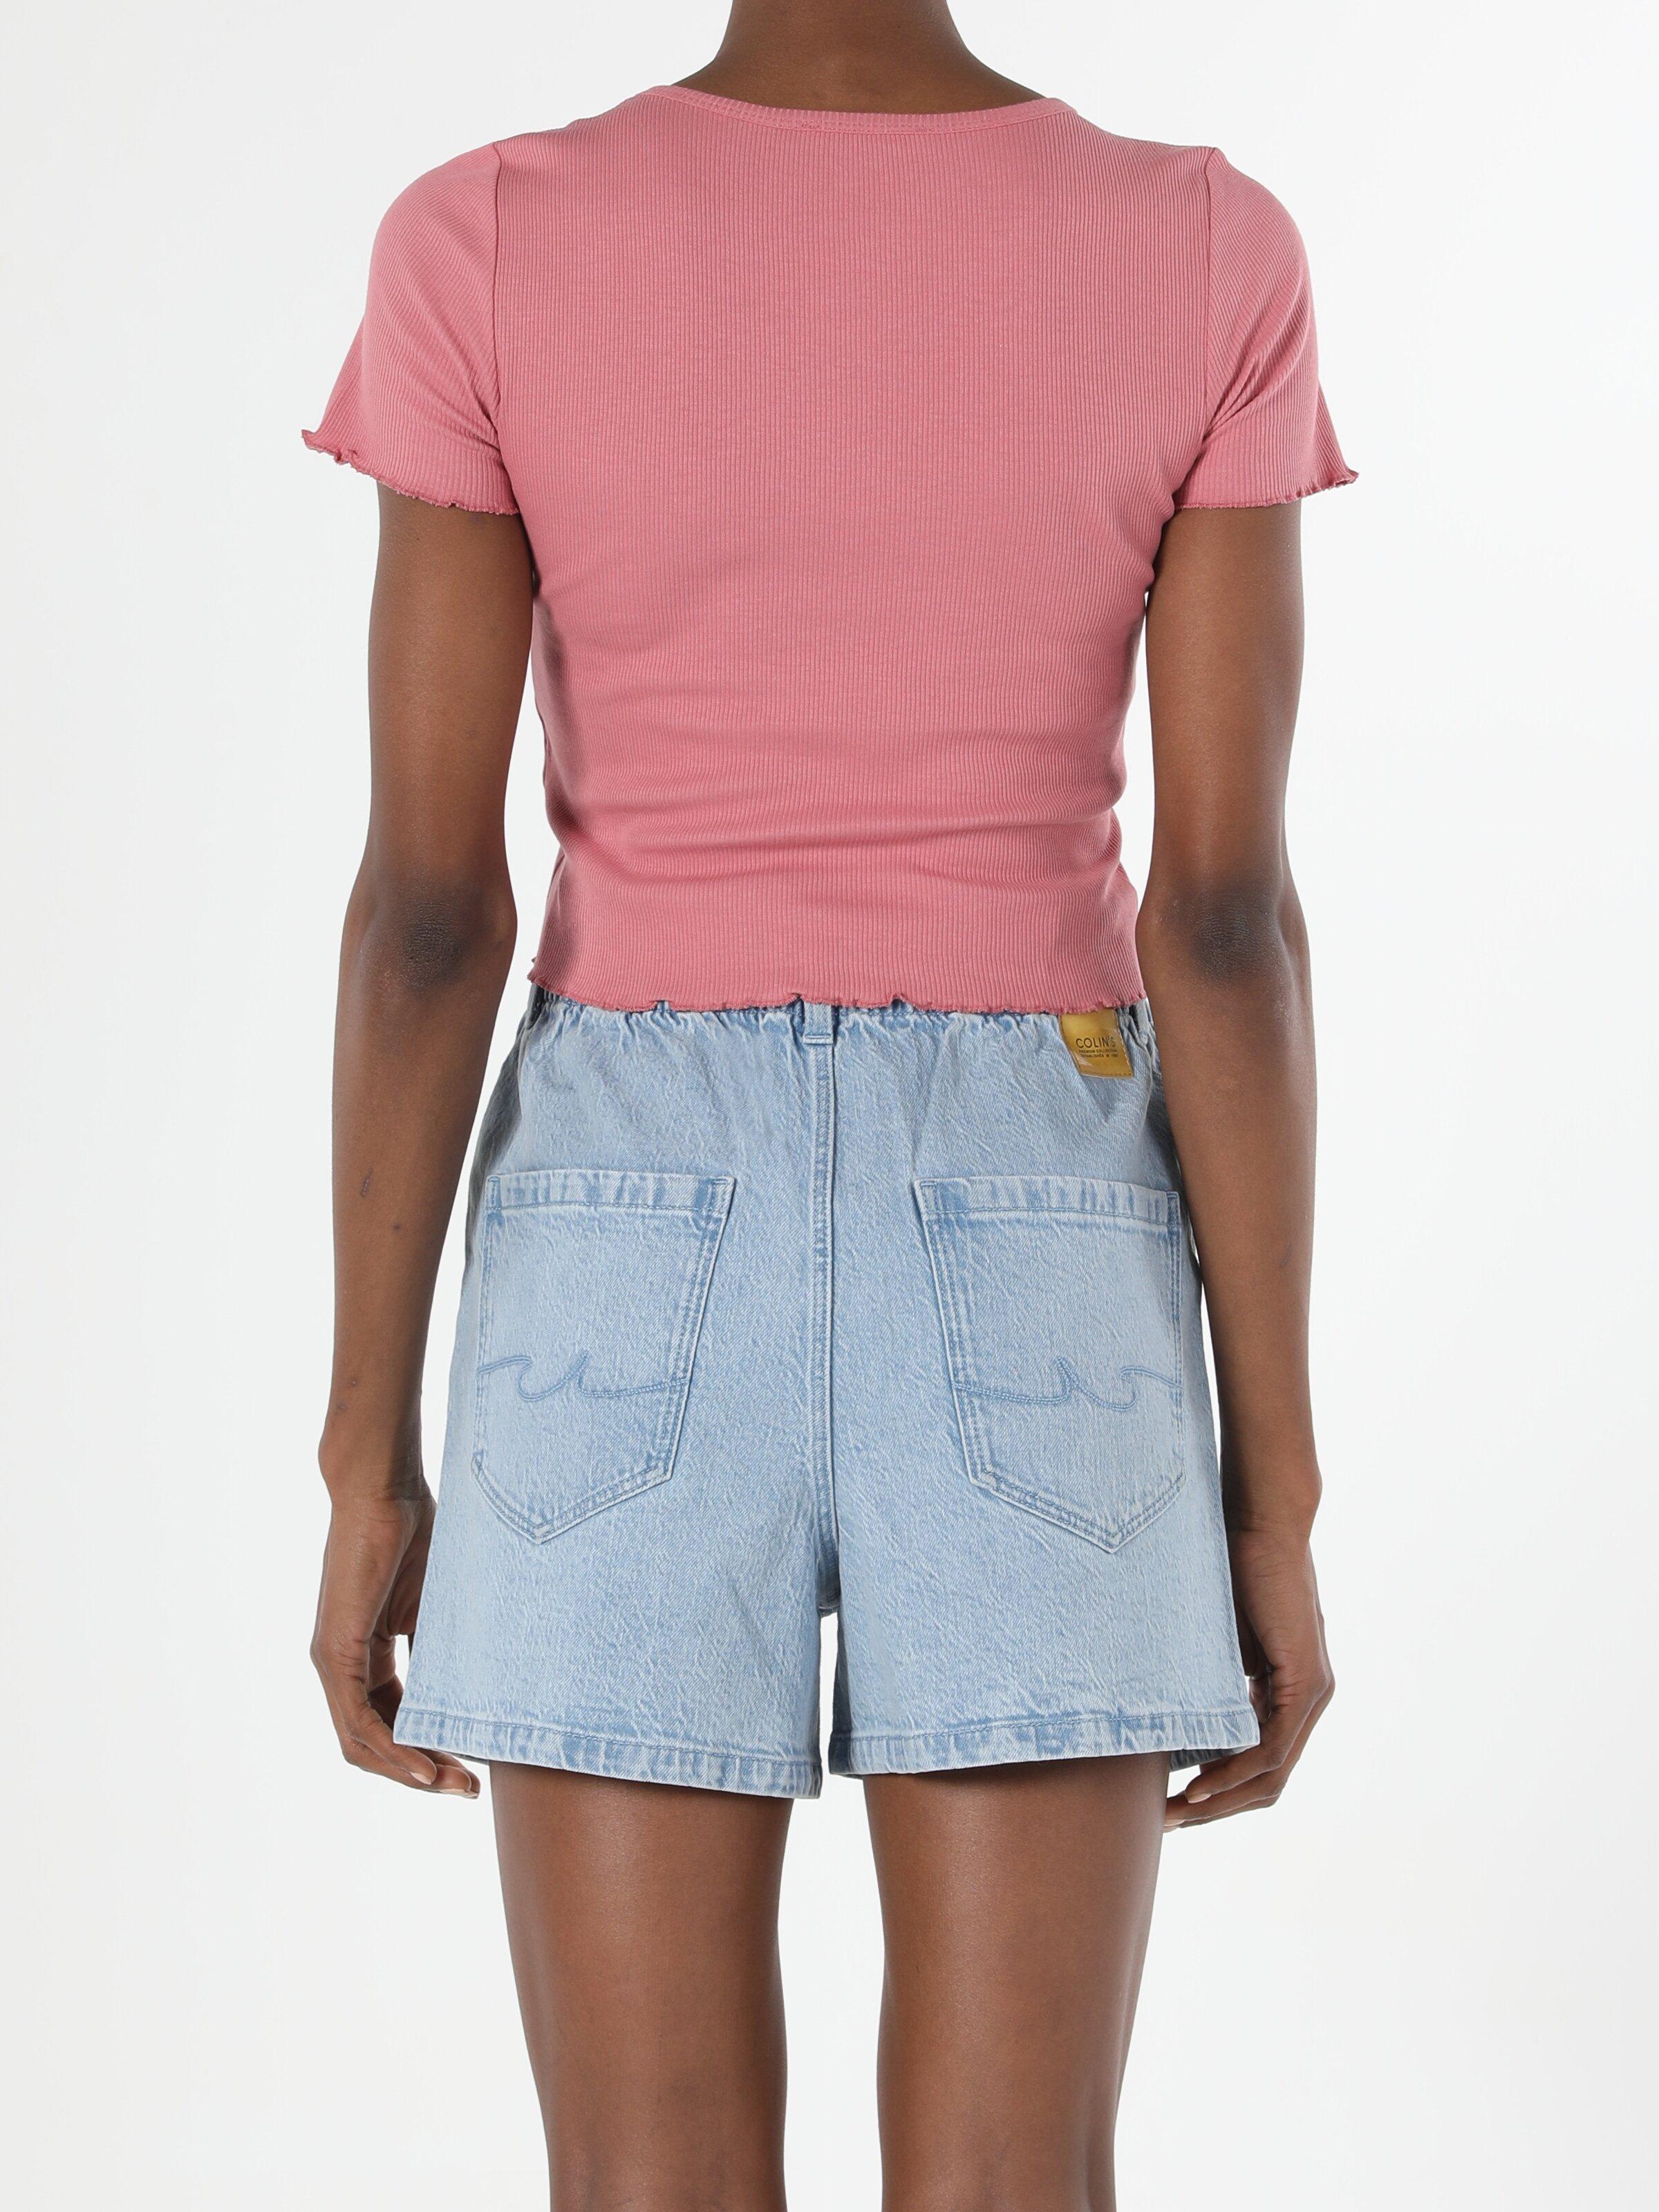 Slim Fit Bisiklet Yaka Örme Kadın Pembe Kısa Kol Tişört